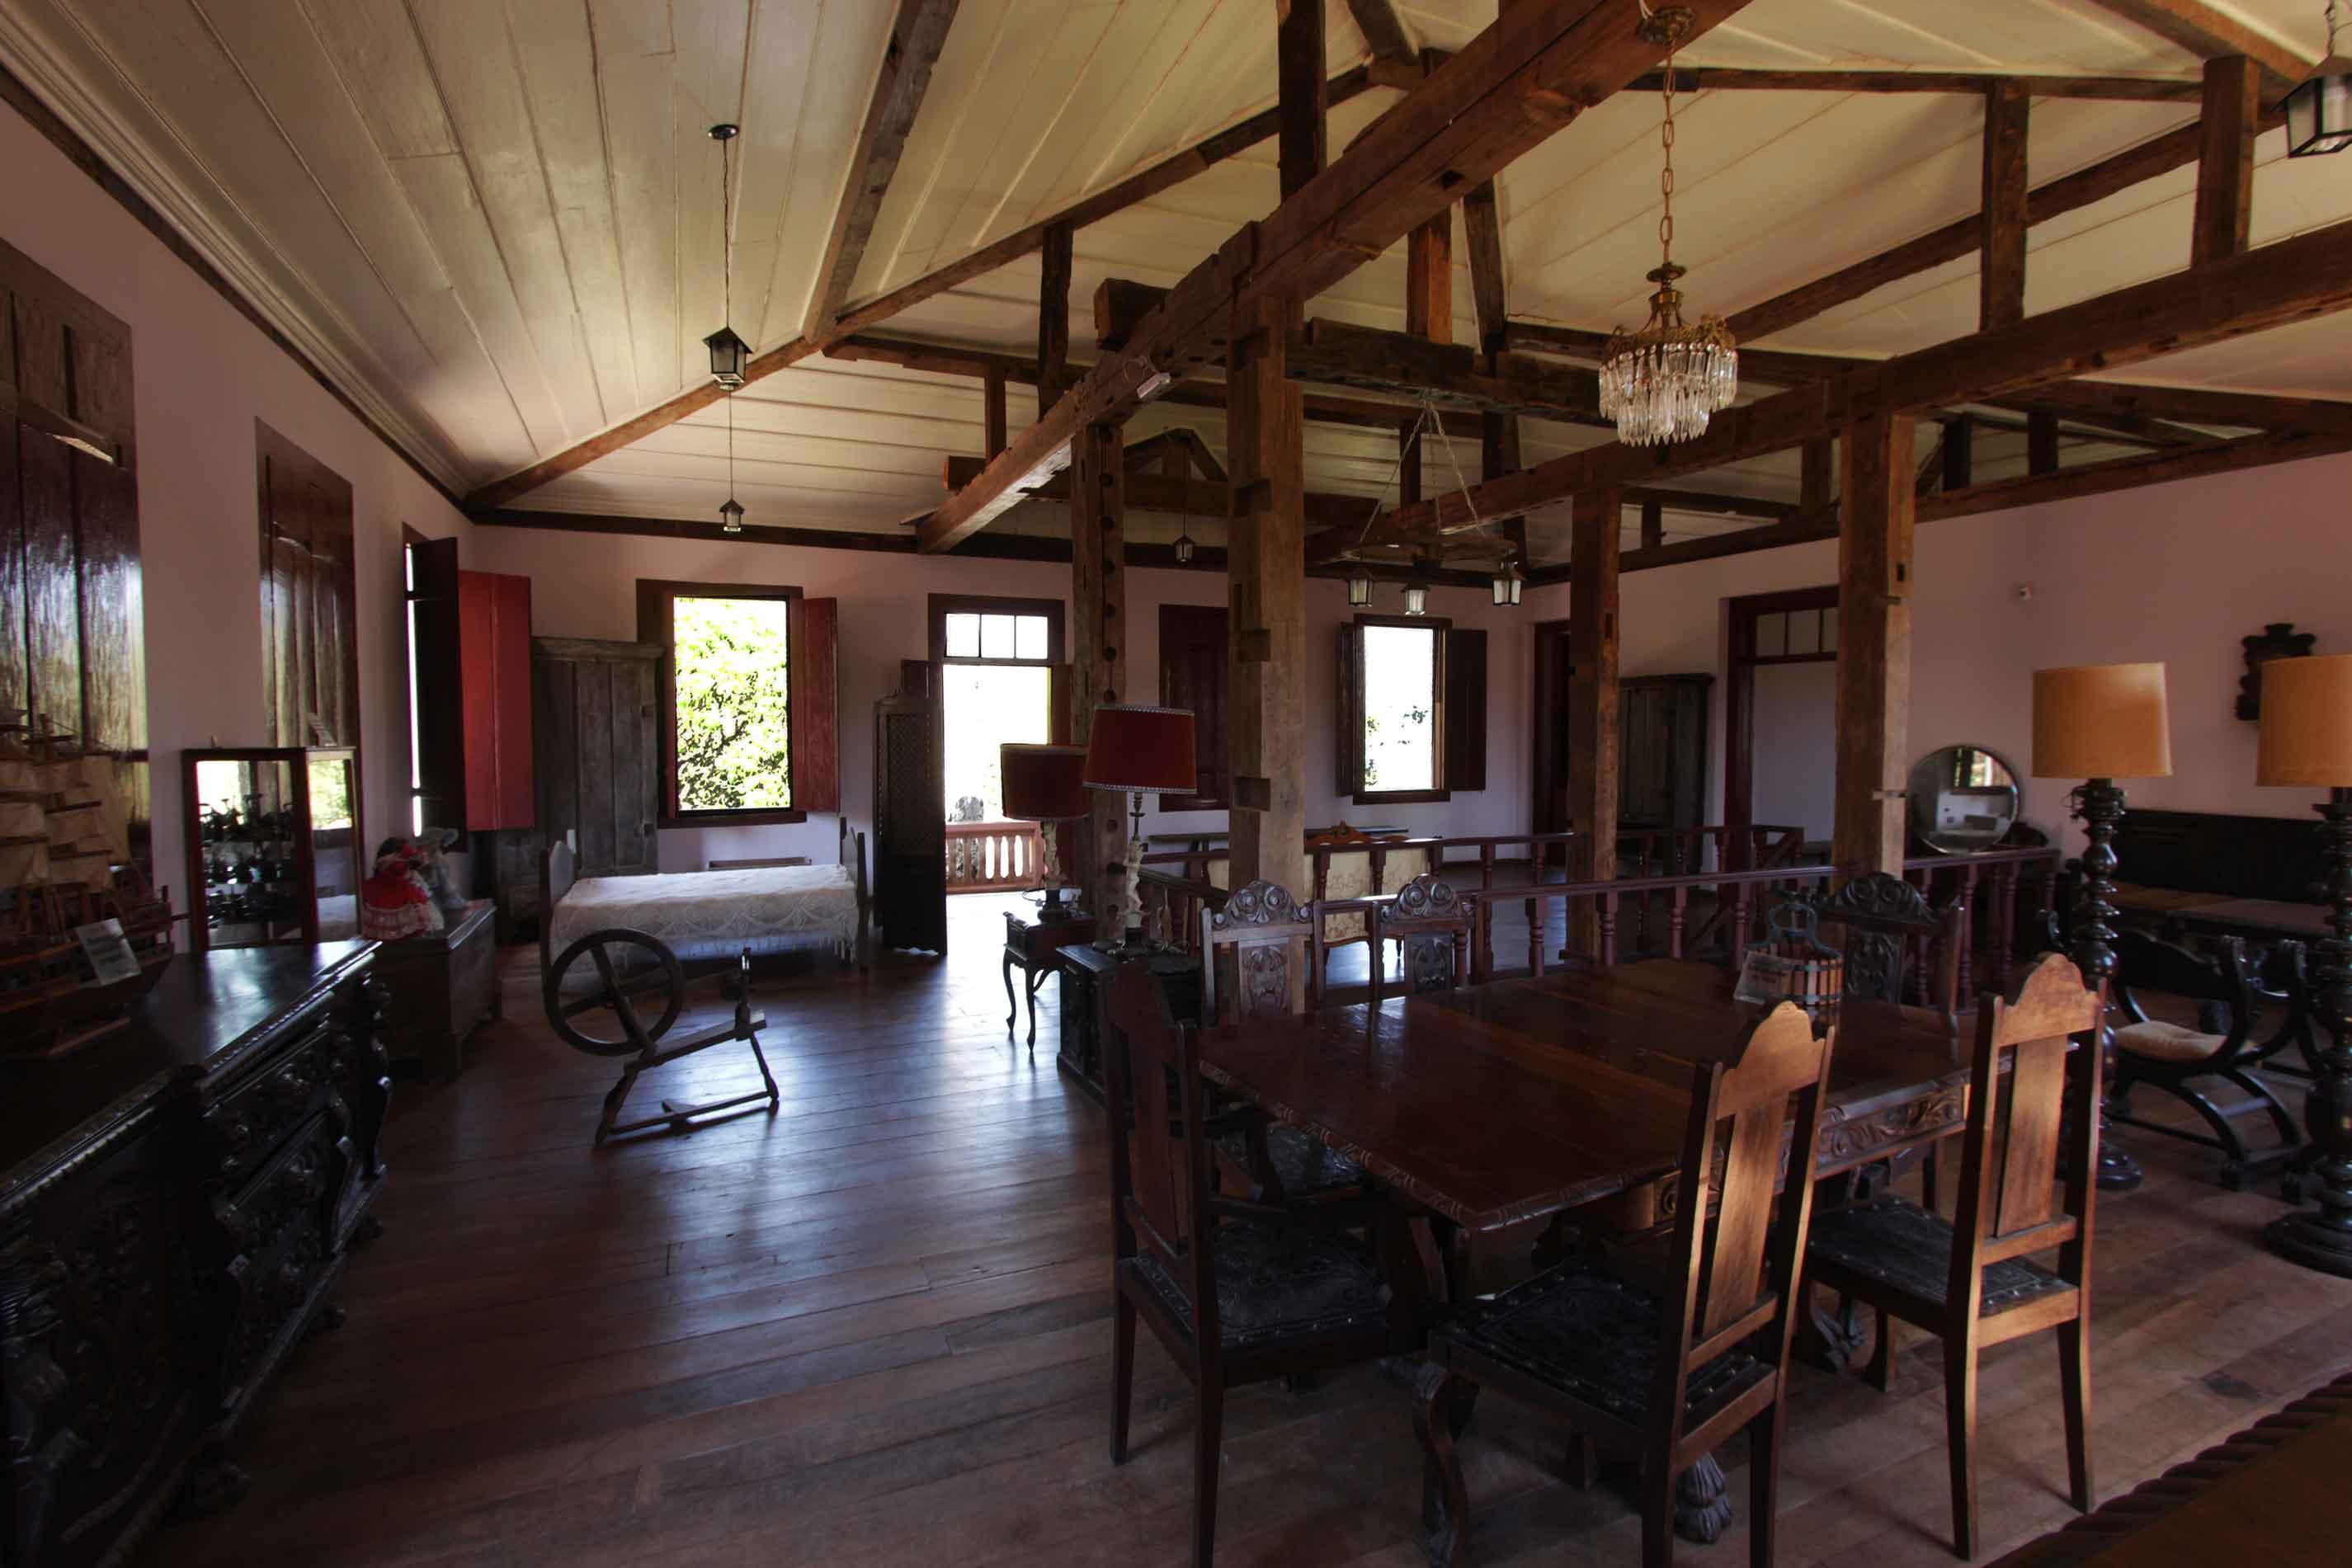 jarinu-historia-museu-fazenda-terra-brasil-interior-bx